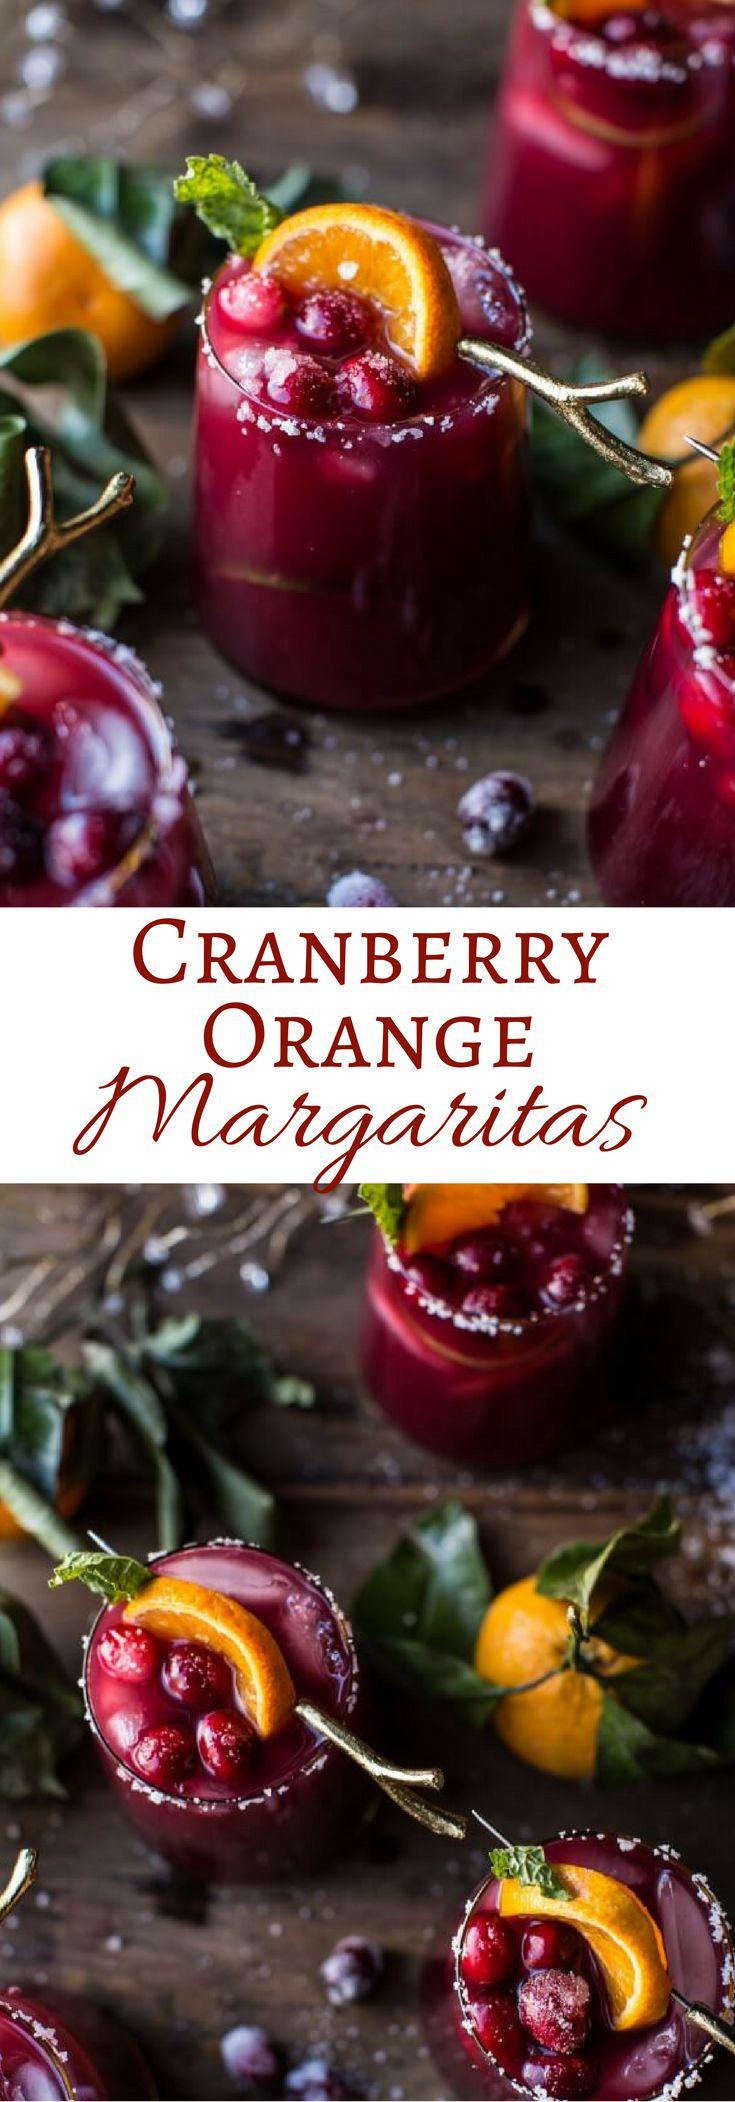 Cranberry Orange Margaritas | halfbakedharvest.com @hbharvest